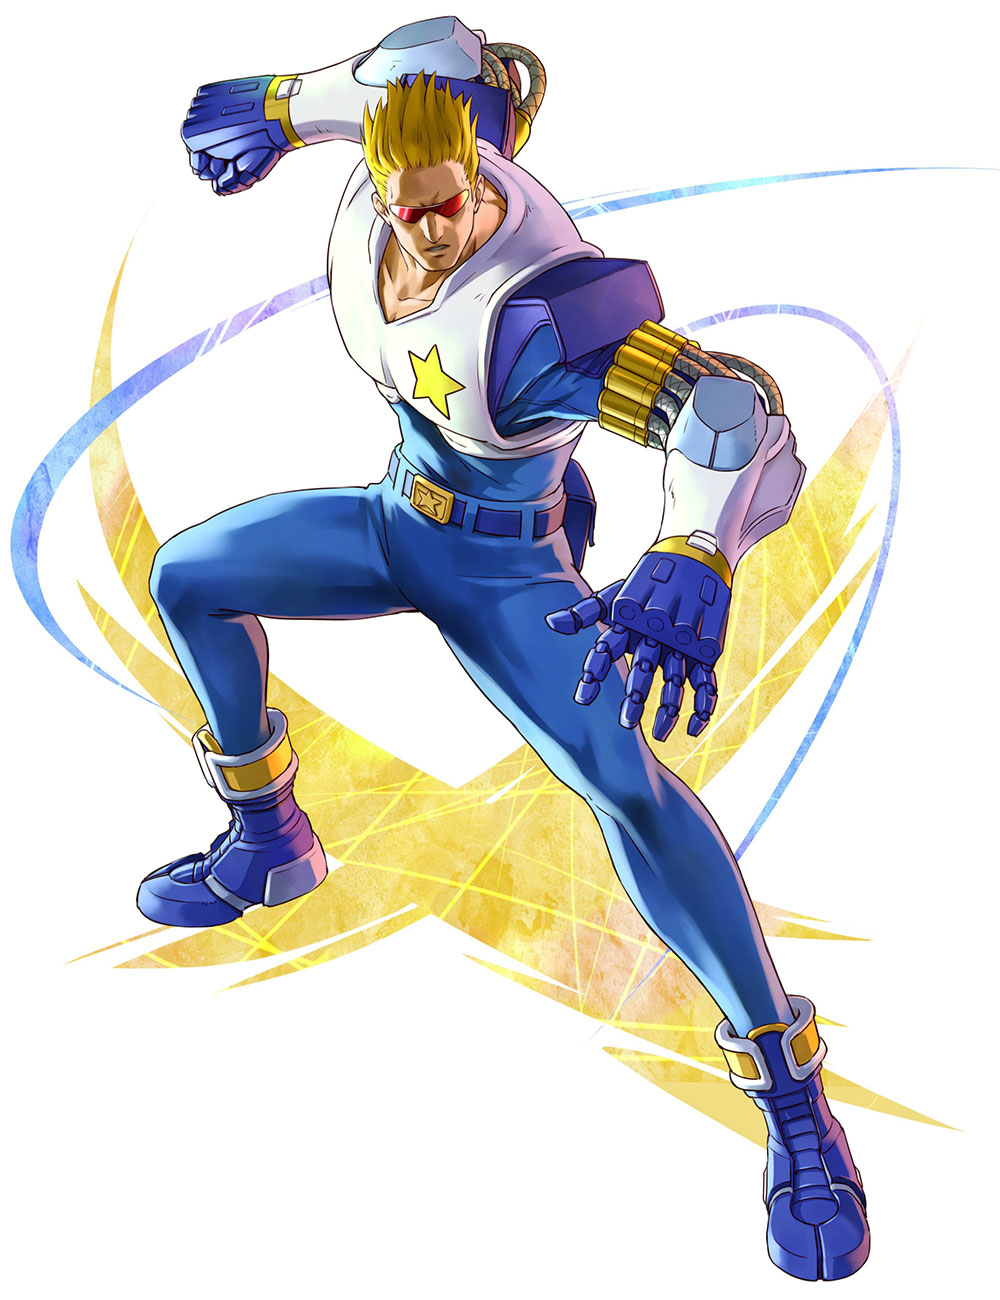 Goku Wallpaper Hd Captain Commando Heihachi Mishima June Amp B B Hood Join